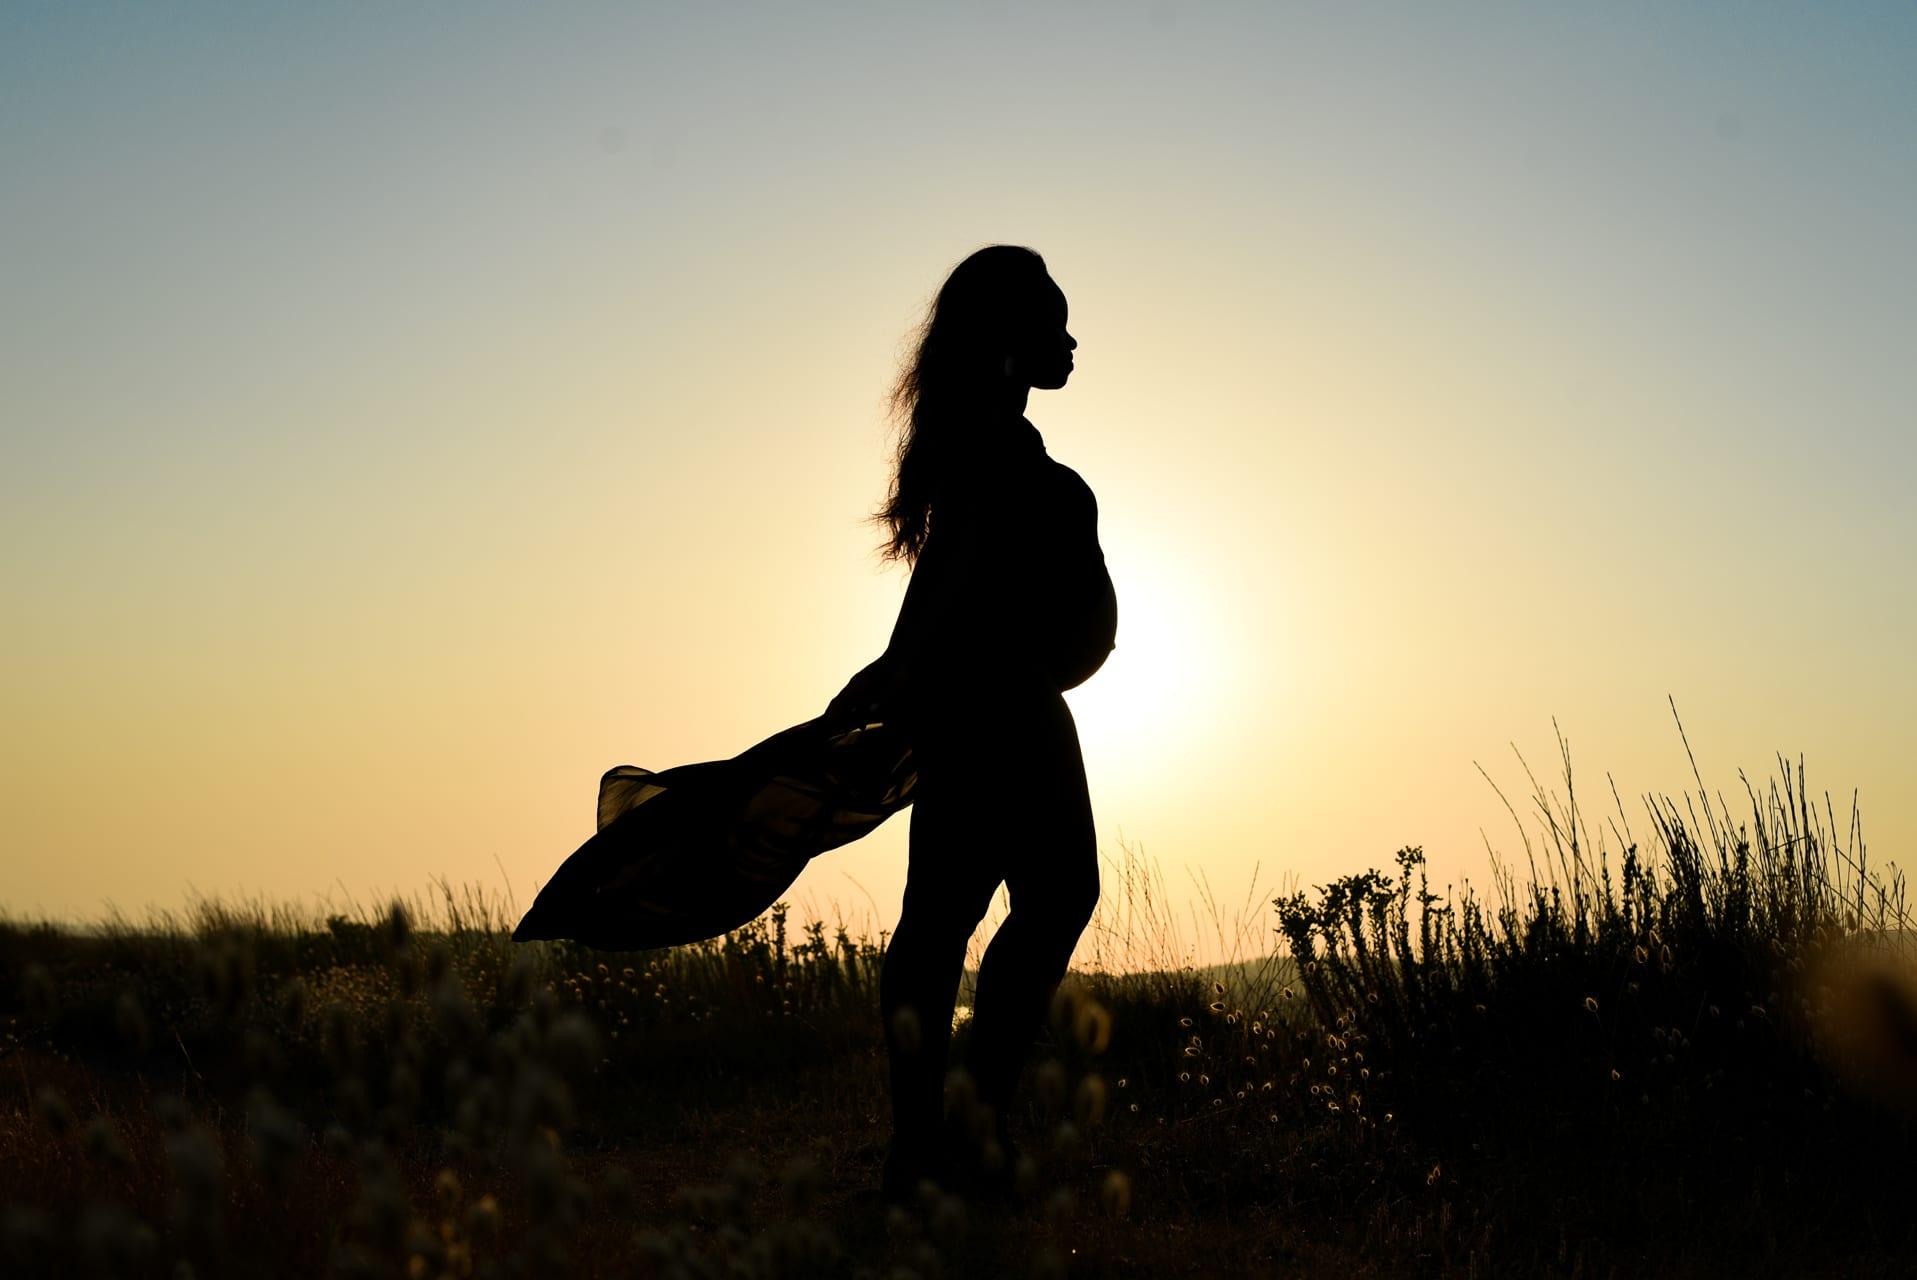 grossesse golden hour contre jour silhouette